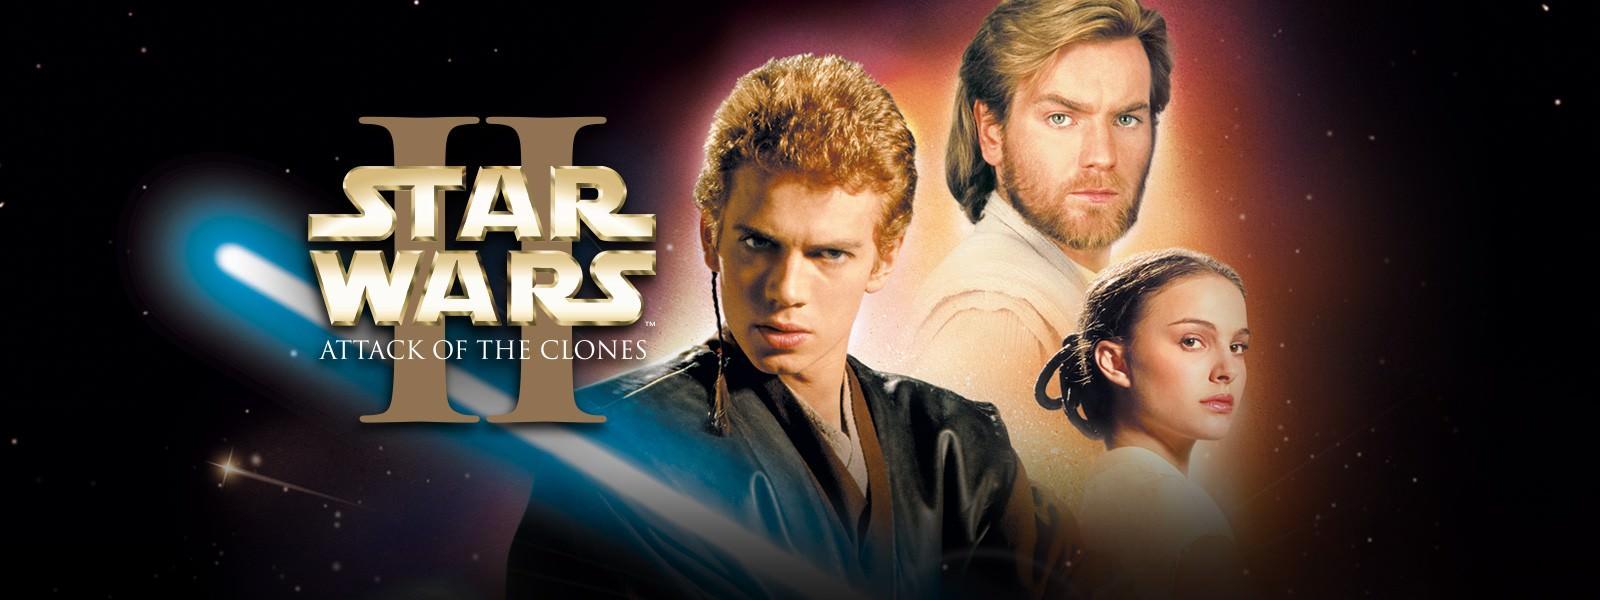 Movie, Star Wars Episode II: Attack of the Clones(美國, 2002) / 星際大戰二部曲:複製人全面進攻(台灣) / 星球大战前传:克隆人的进攻(中國) / 星球大戰前傳:複製人侵略(香港), 電影海報, 美國, 橫版